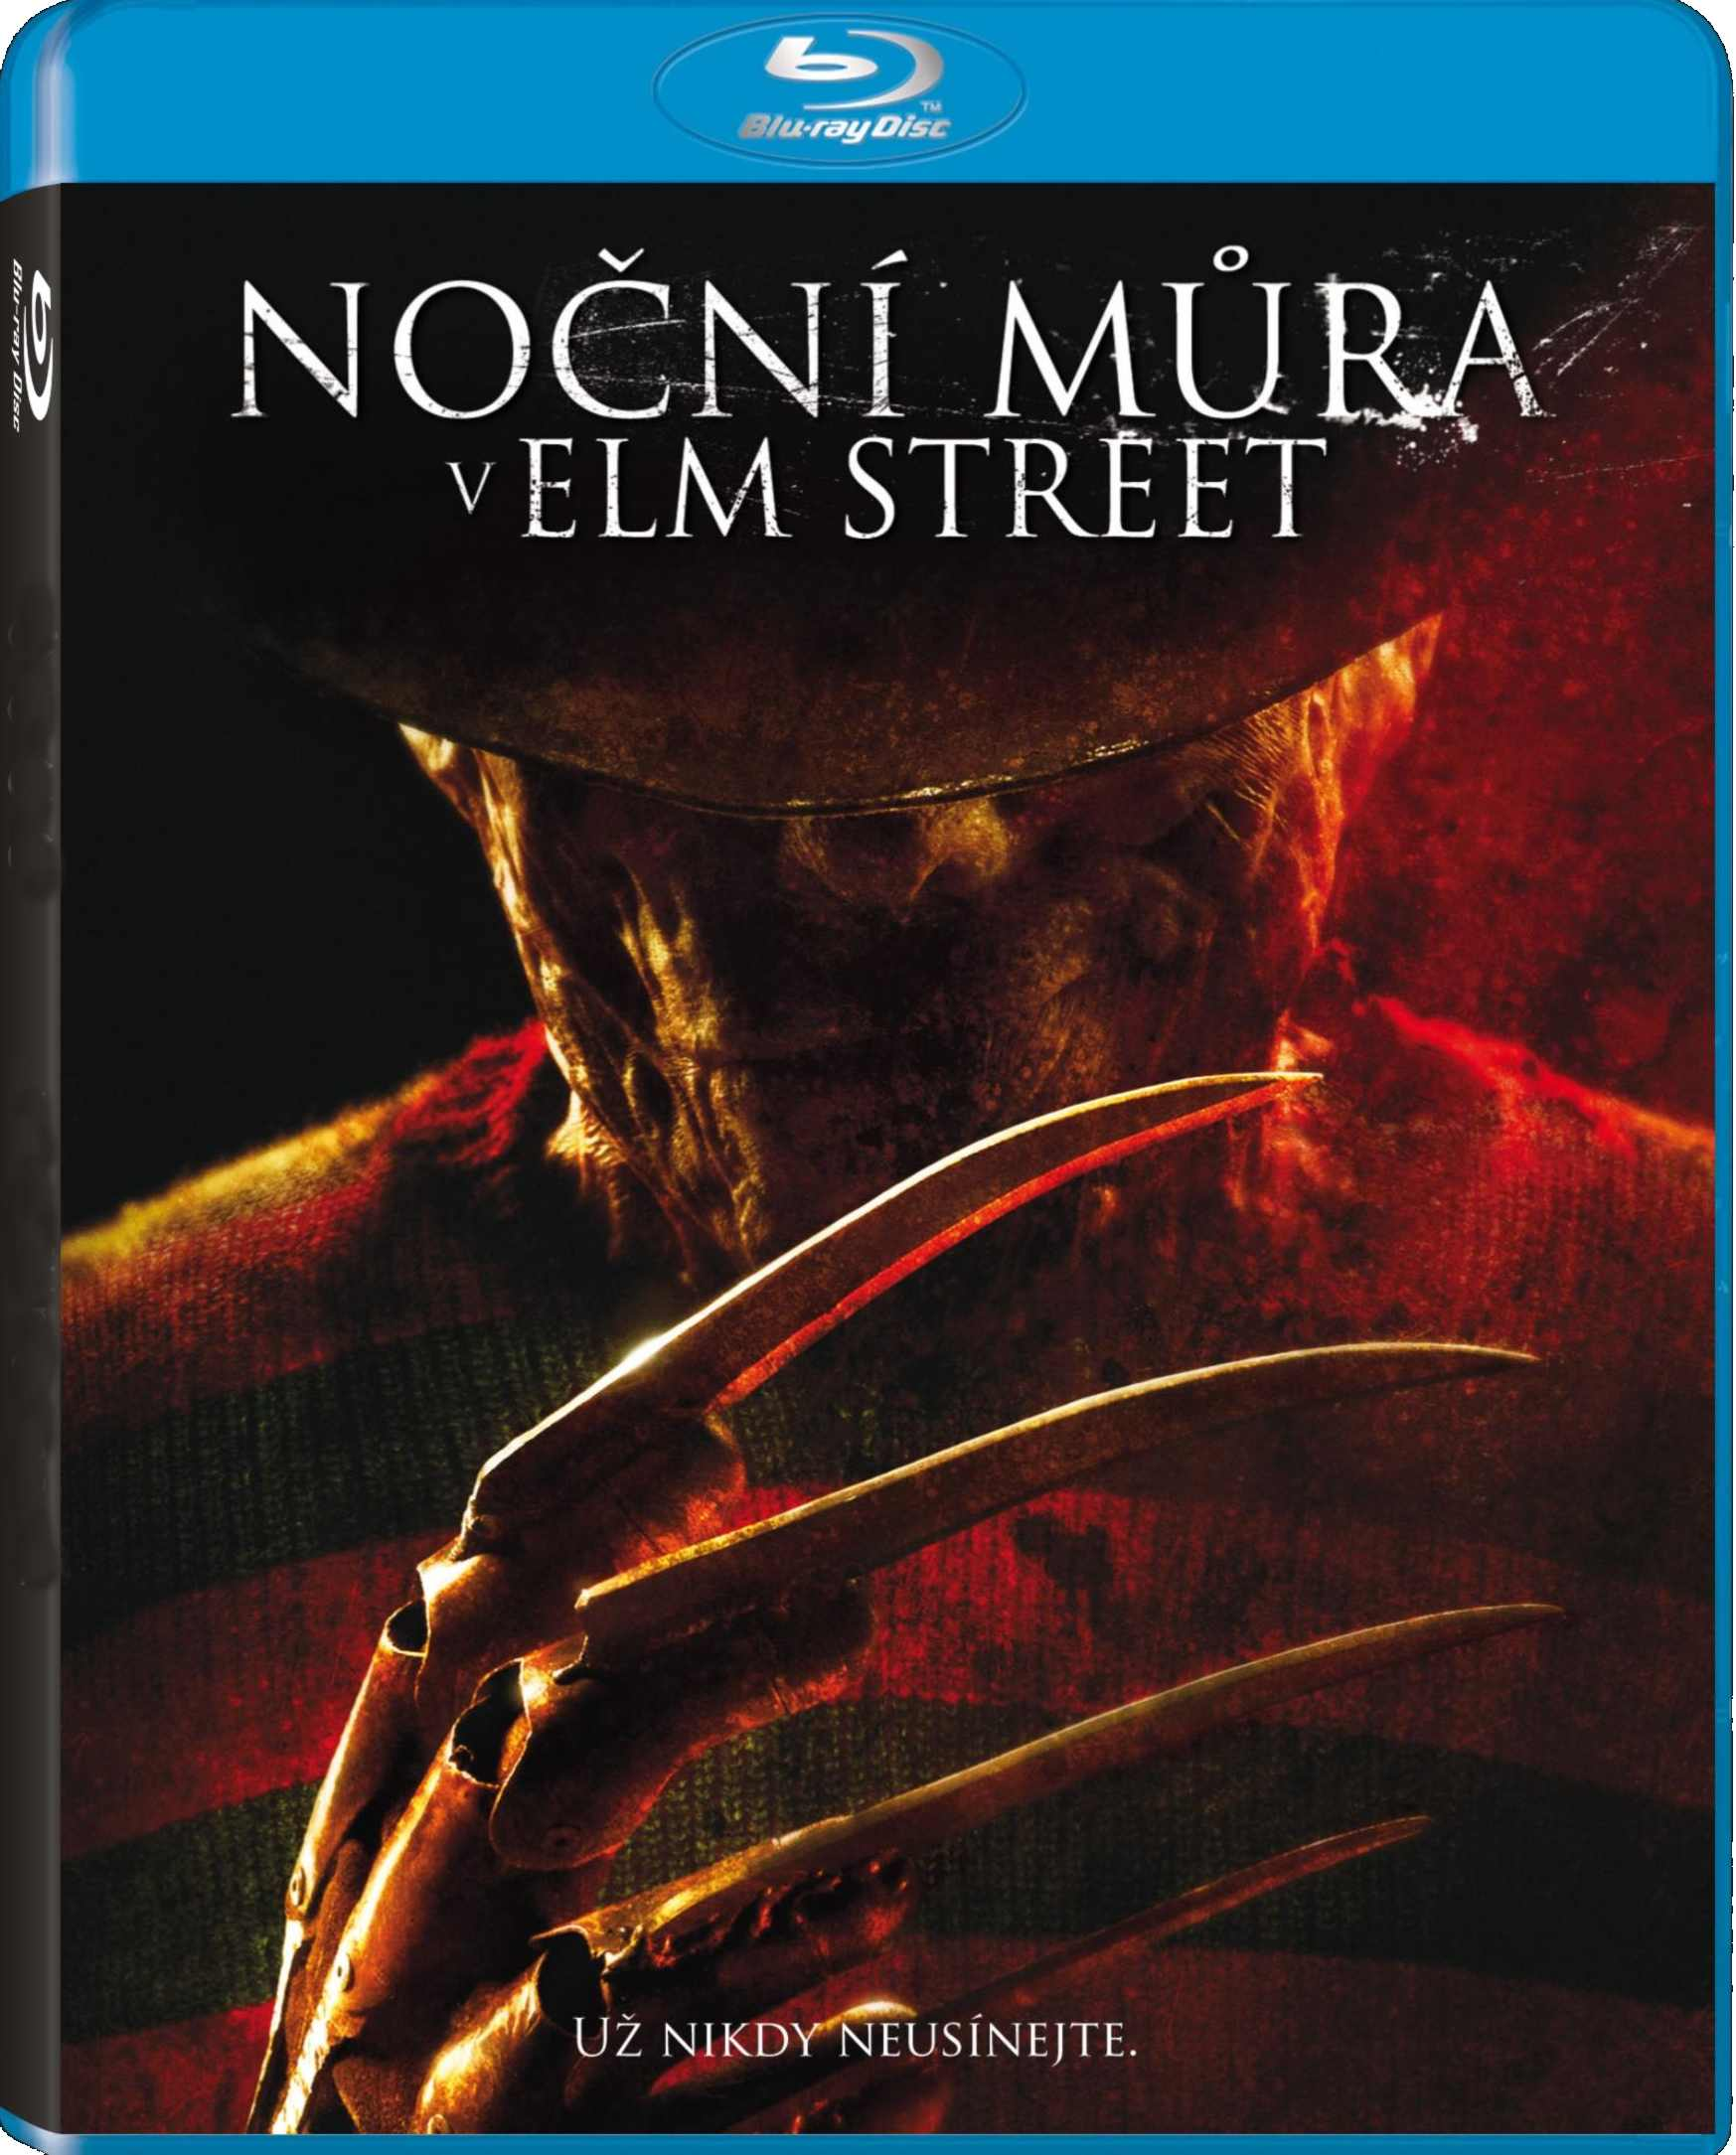 NOČNÍ MŮRA V ELM STREET - 2010 - Blu-ray